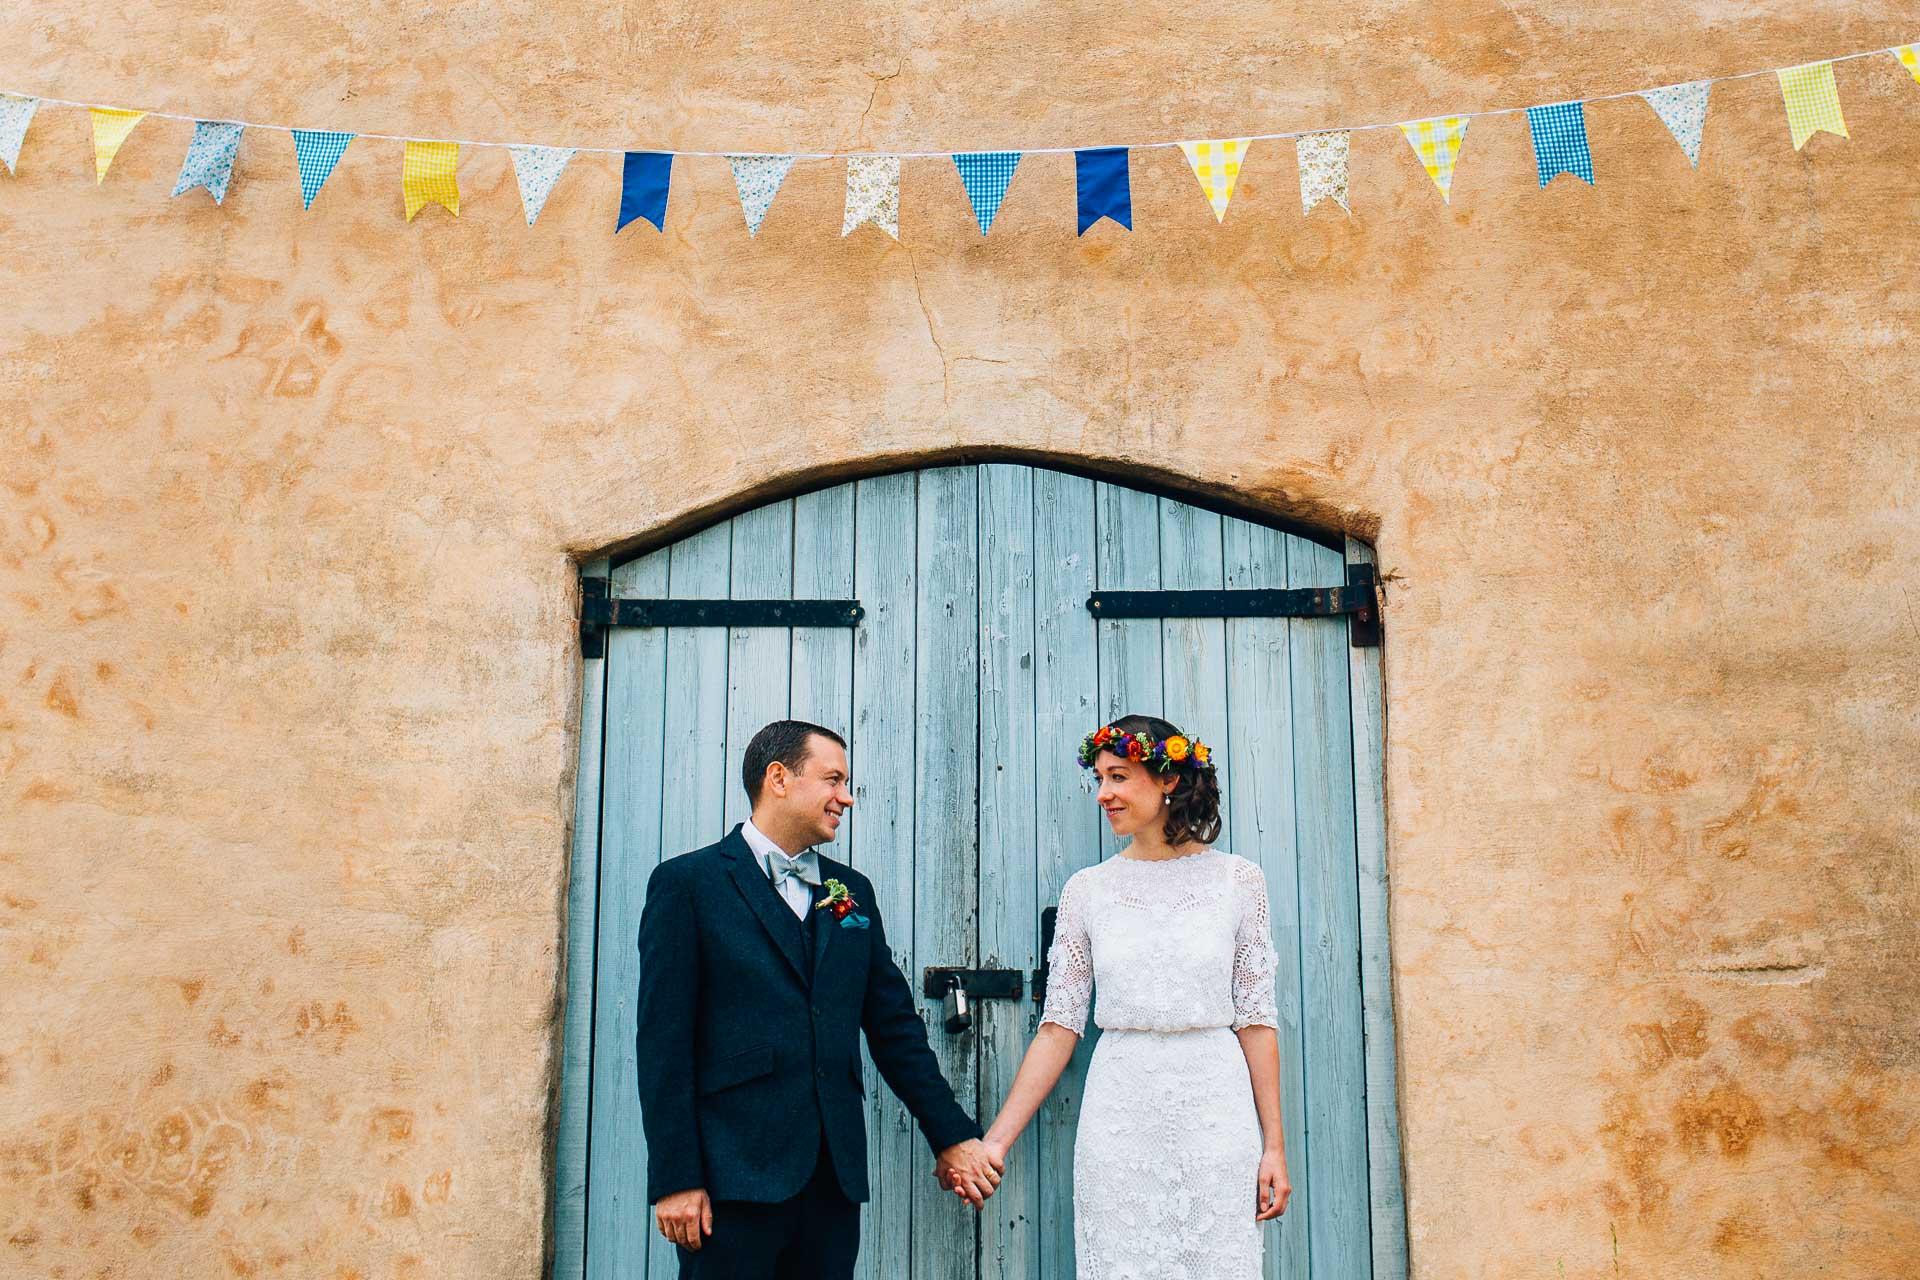 winterbourne-medieval-barn-wedding-photography-emma-andrew-87